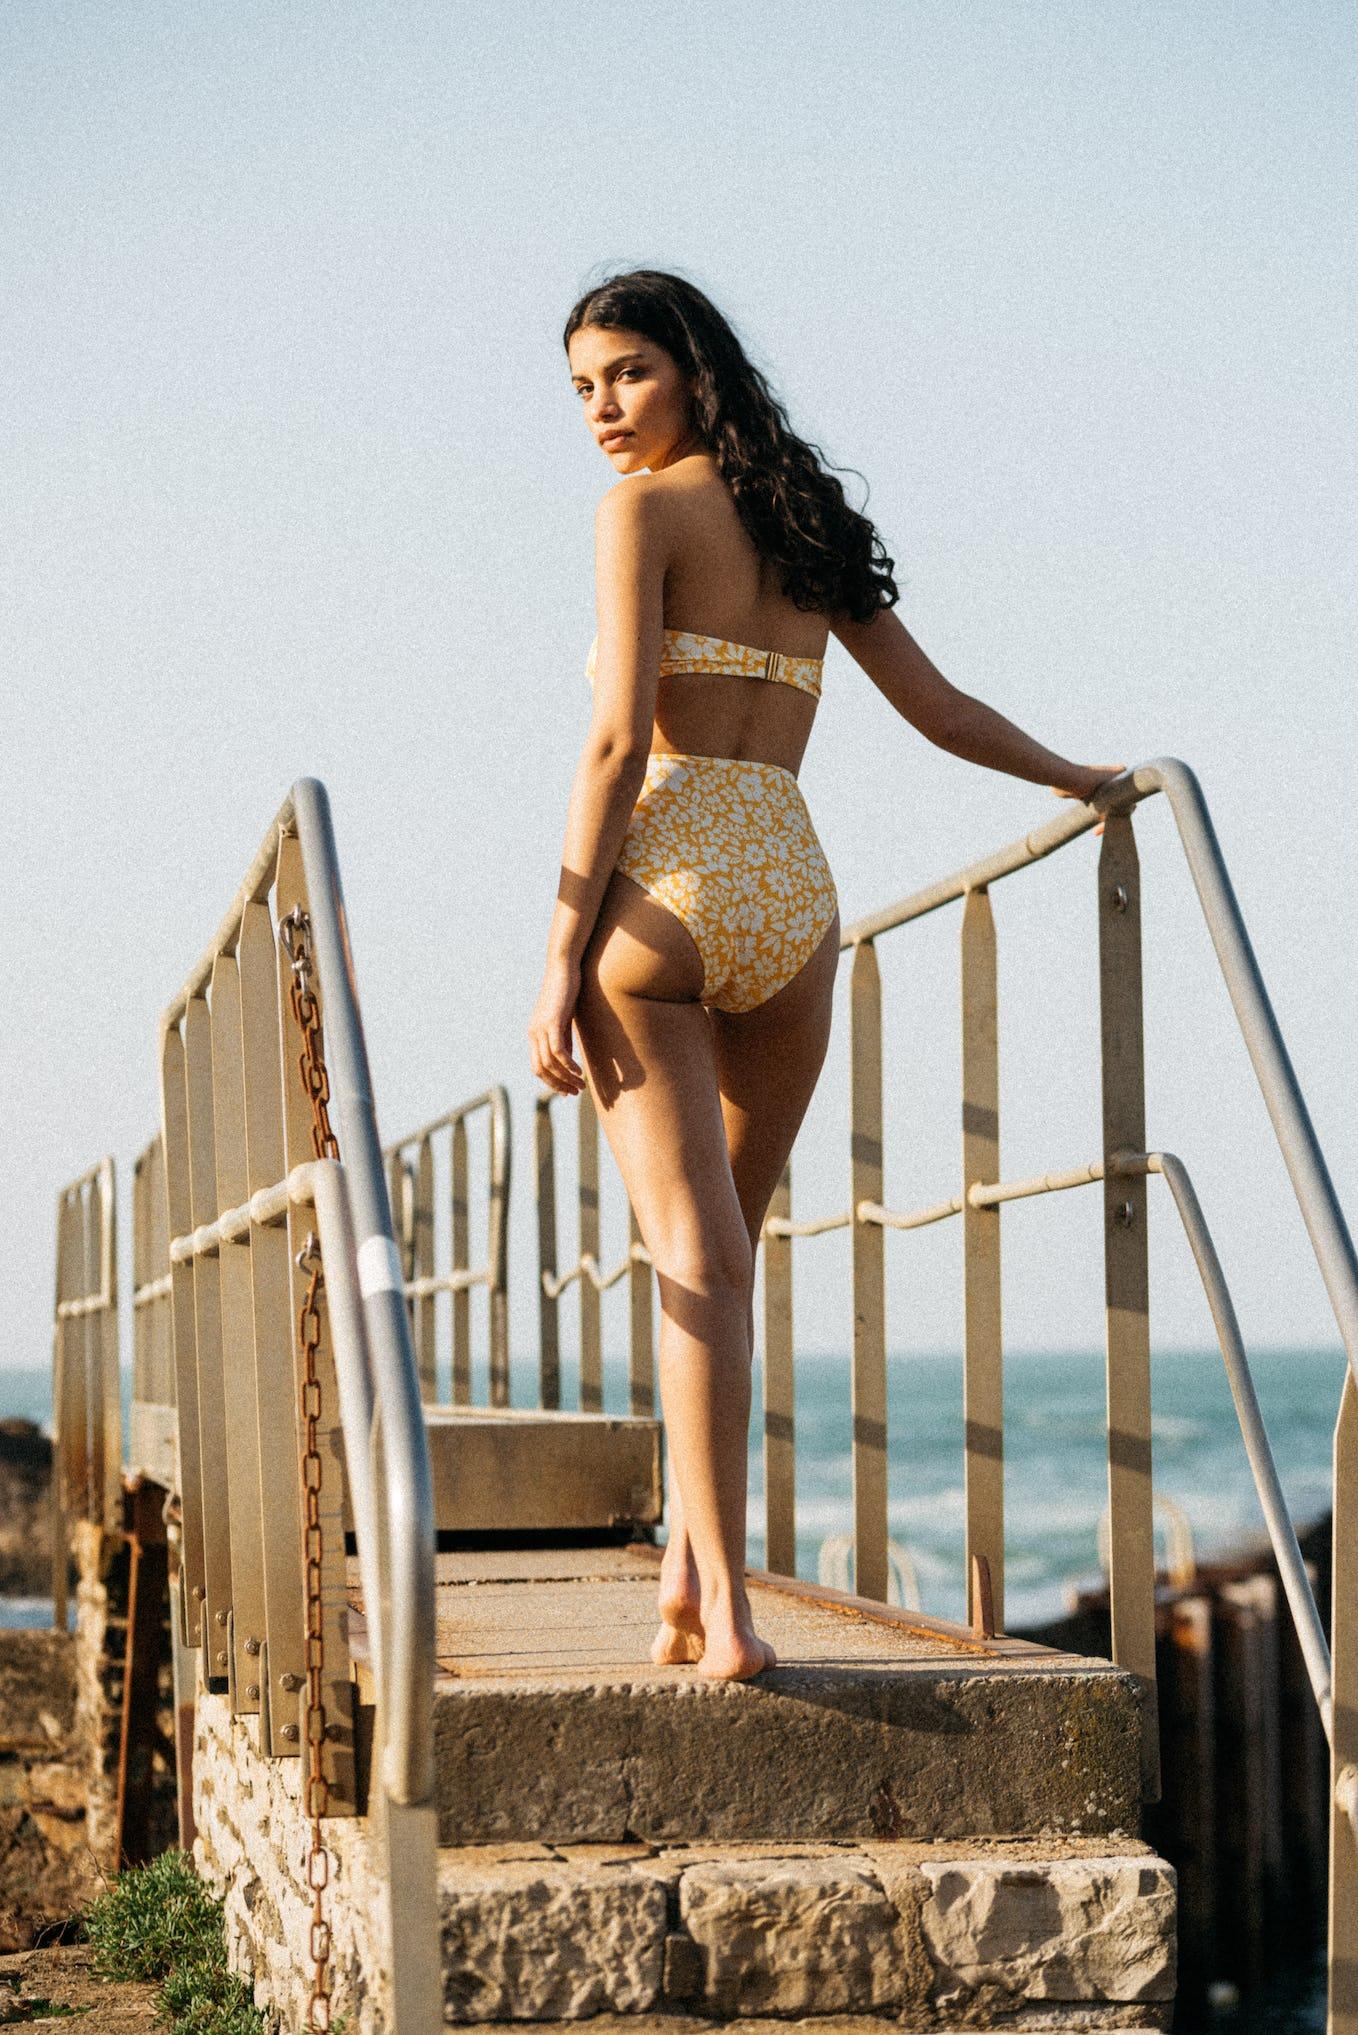 Bikini Sur le sable yellow floral print